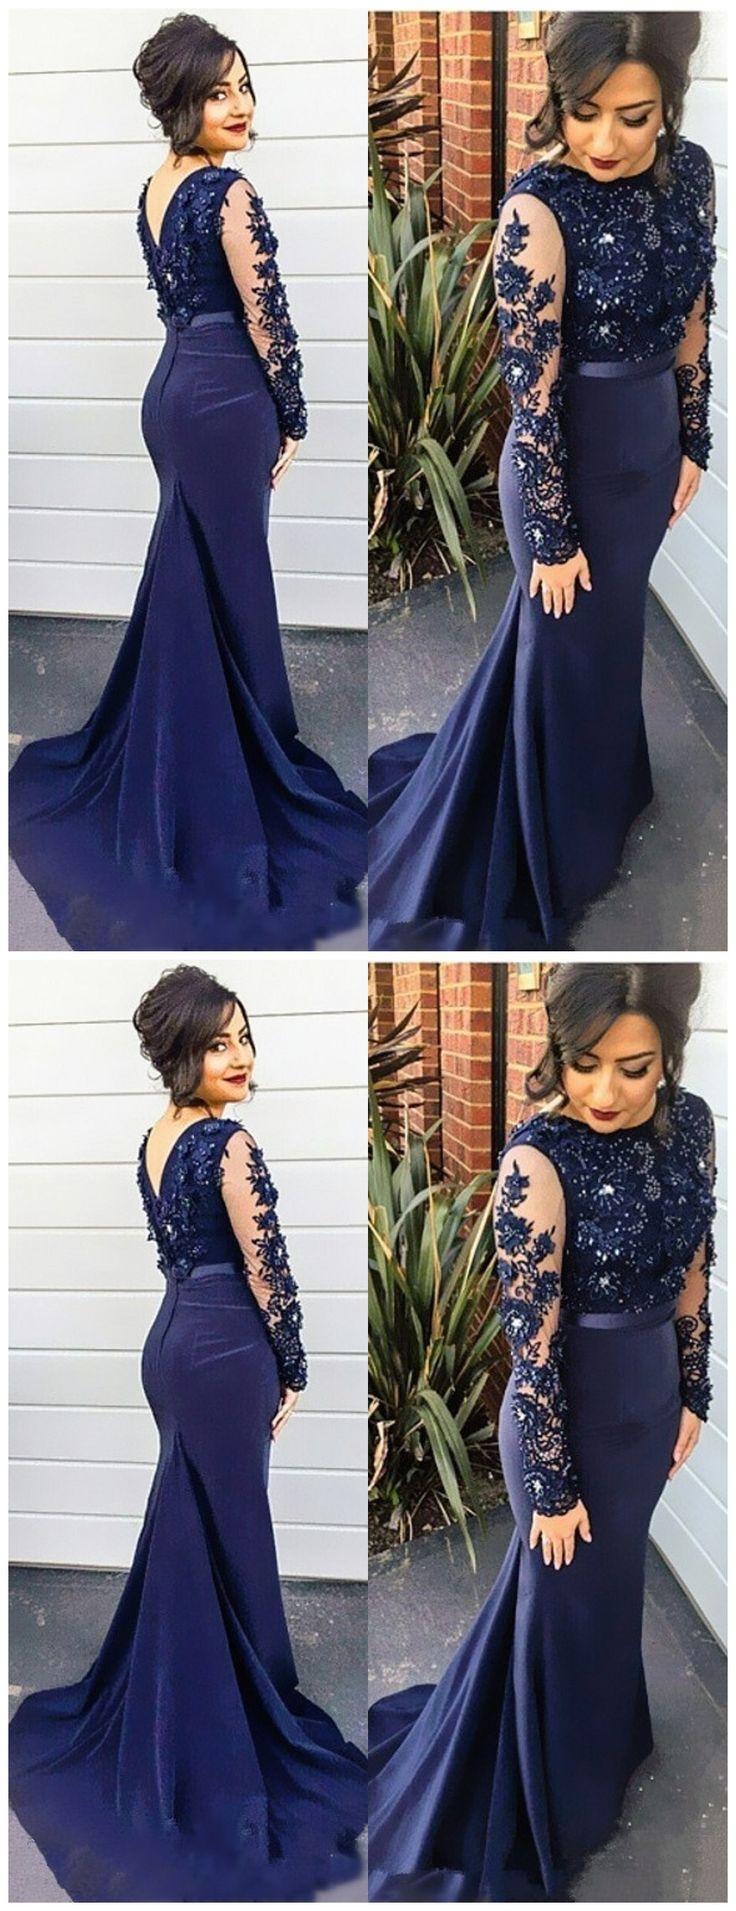 Long Sleeve Prom Dress,Navy Blue Mermaid Prom Dresses,Evening